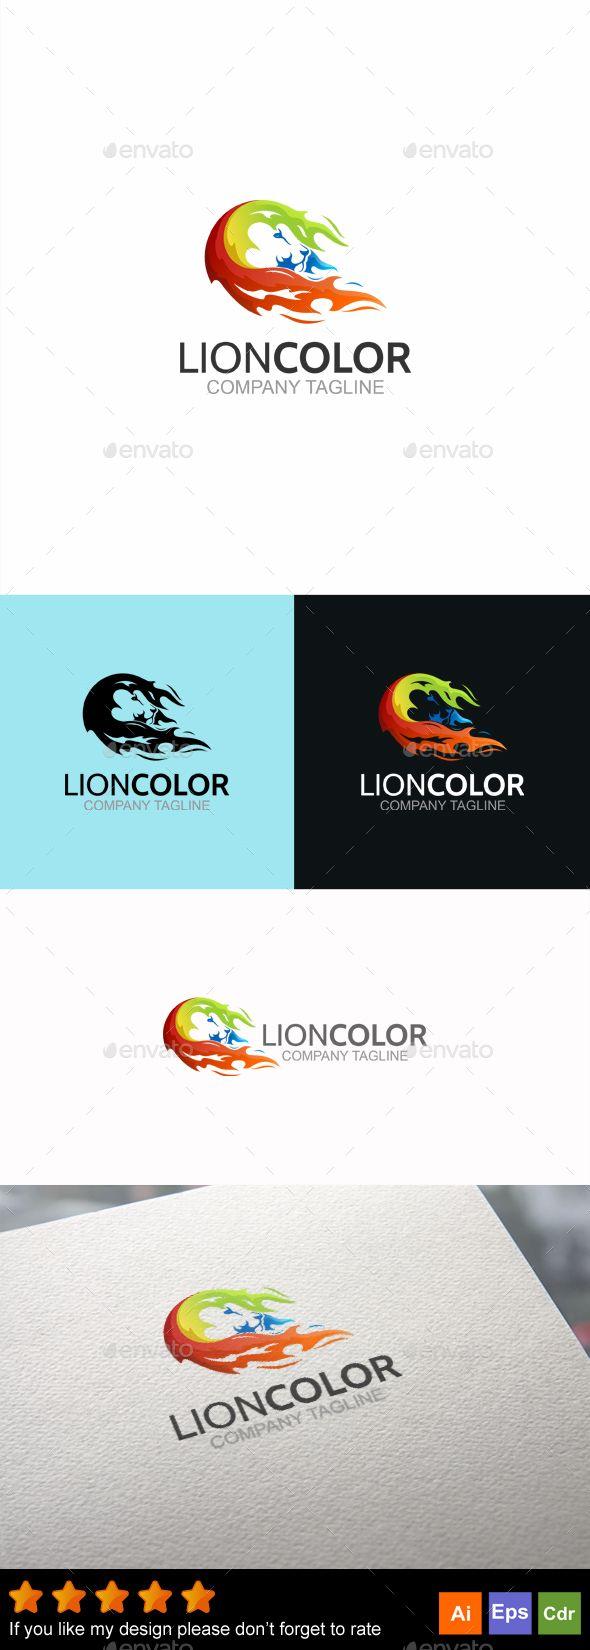 Lion Color Logo Design Template - Animals Logo Design Template ...